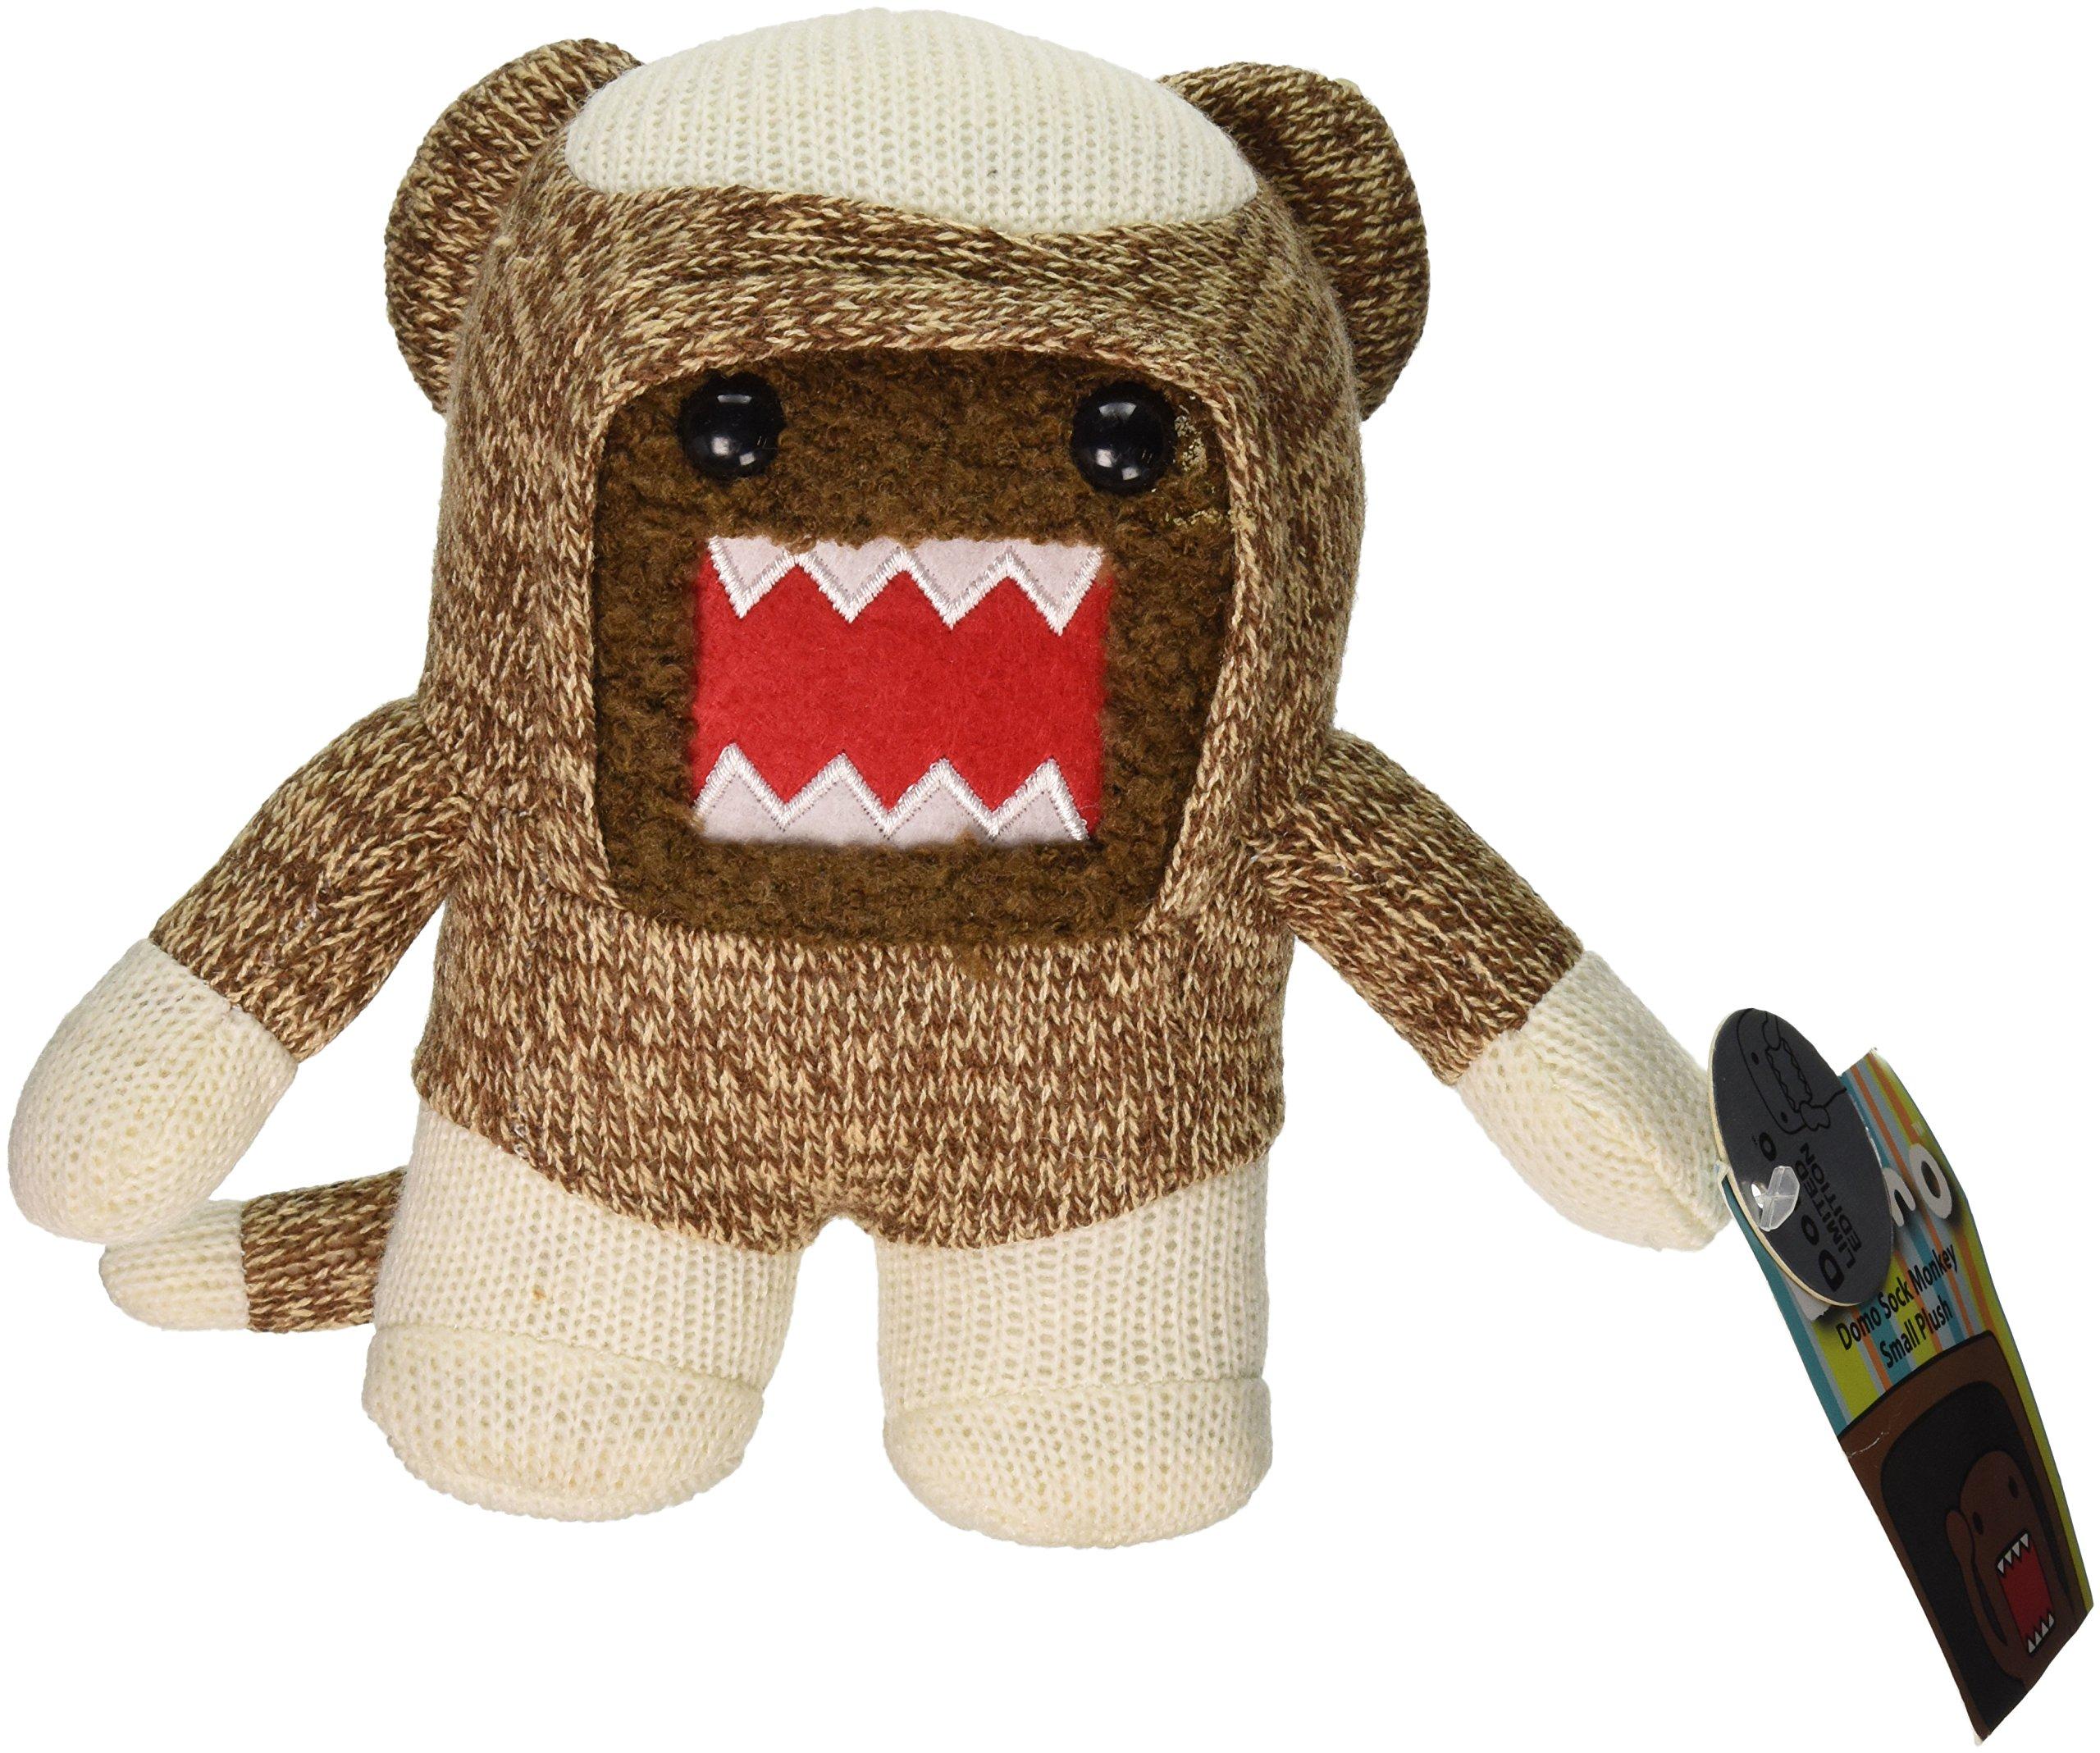 Domo 6.5 Inch Plush Figure Sock Monkey Domo